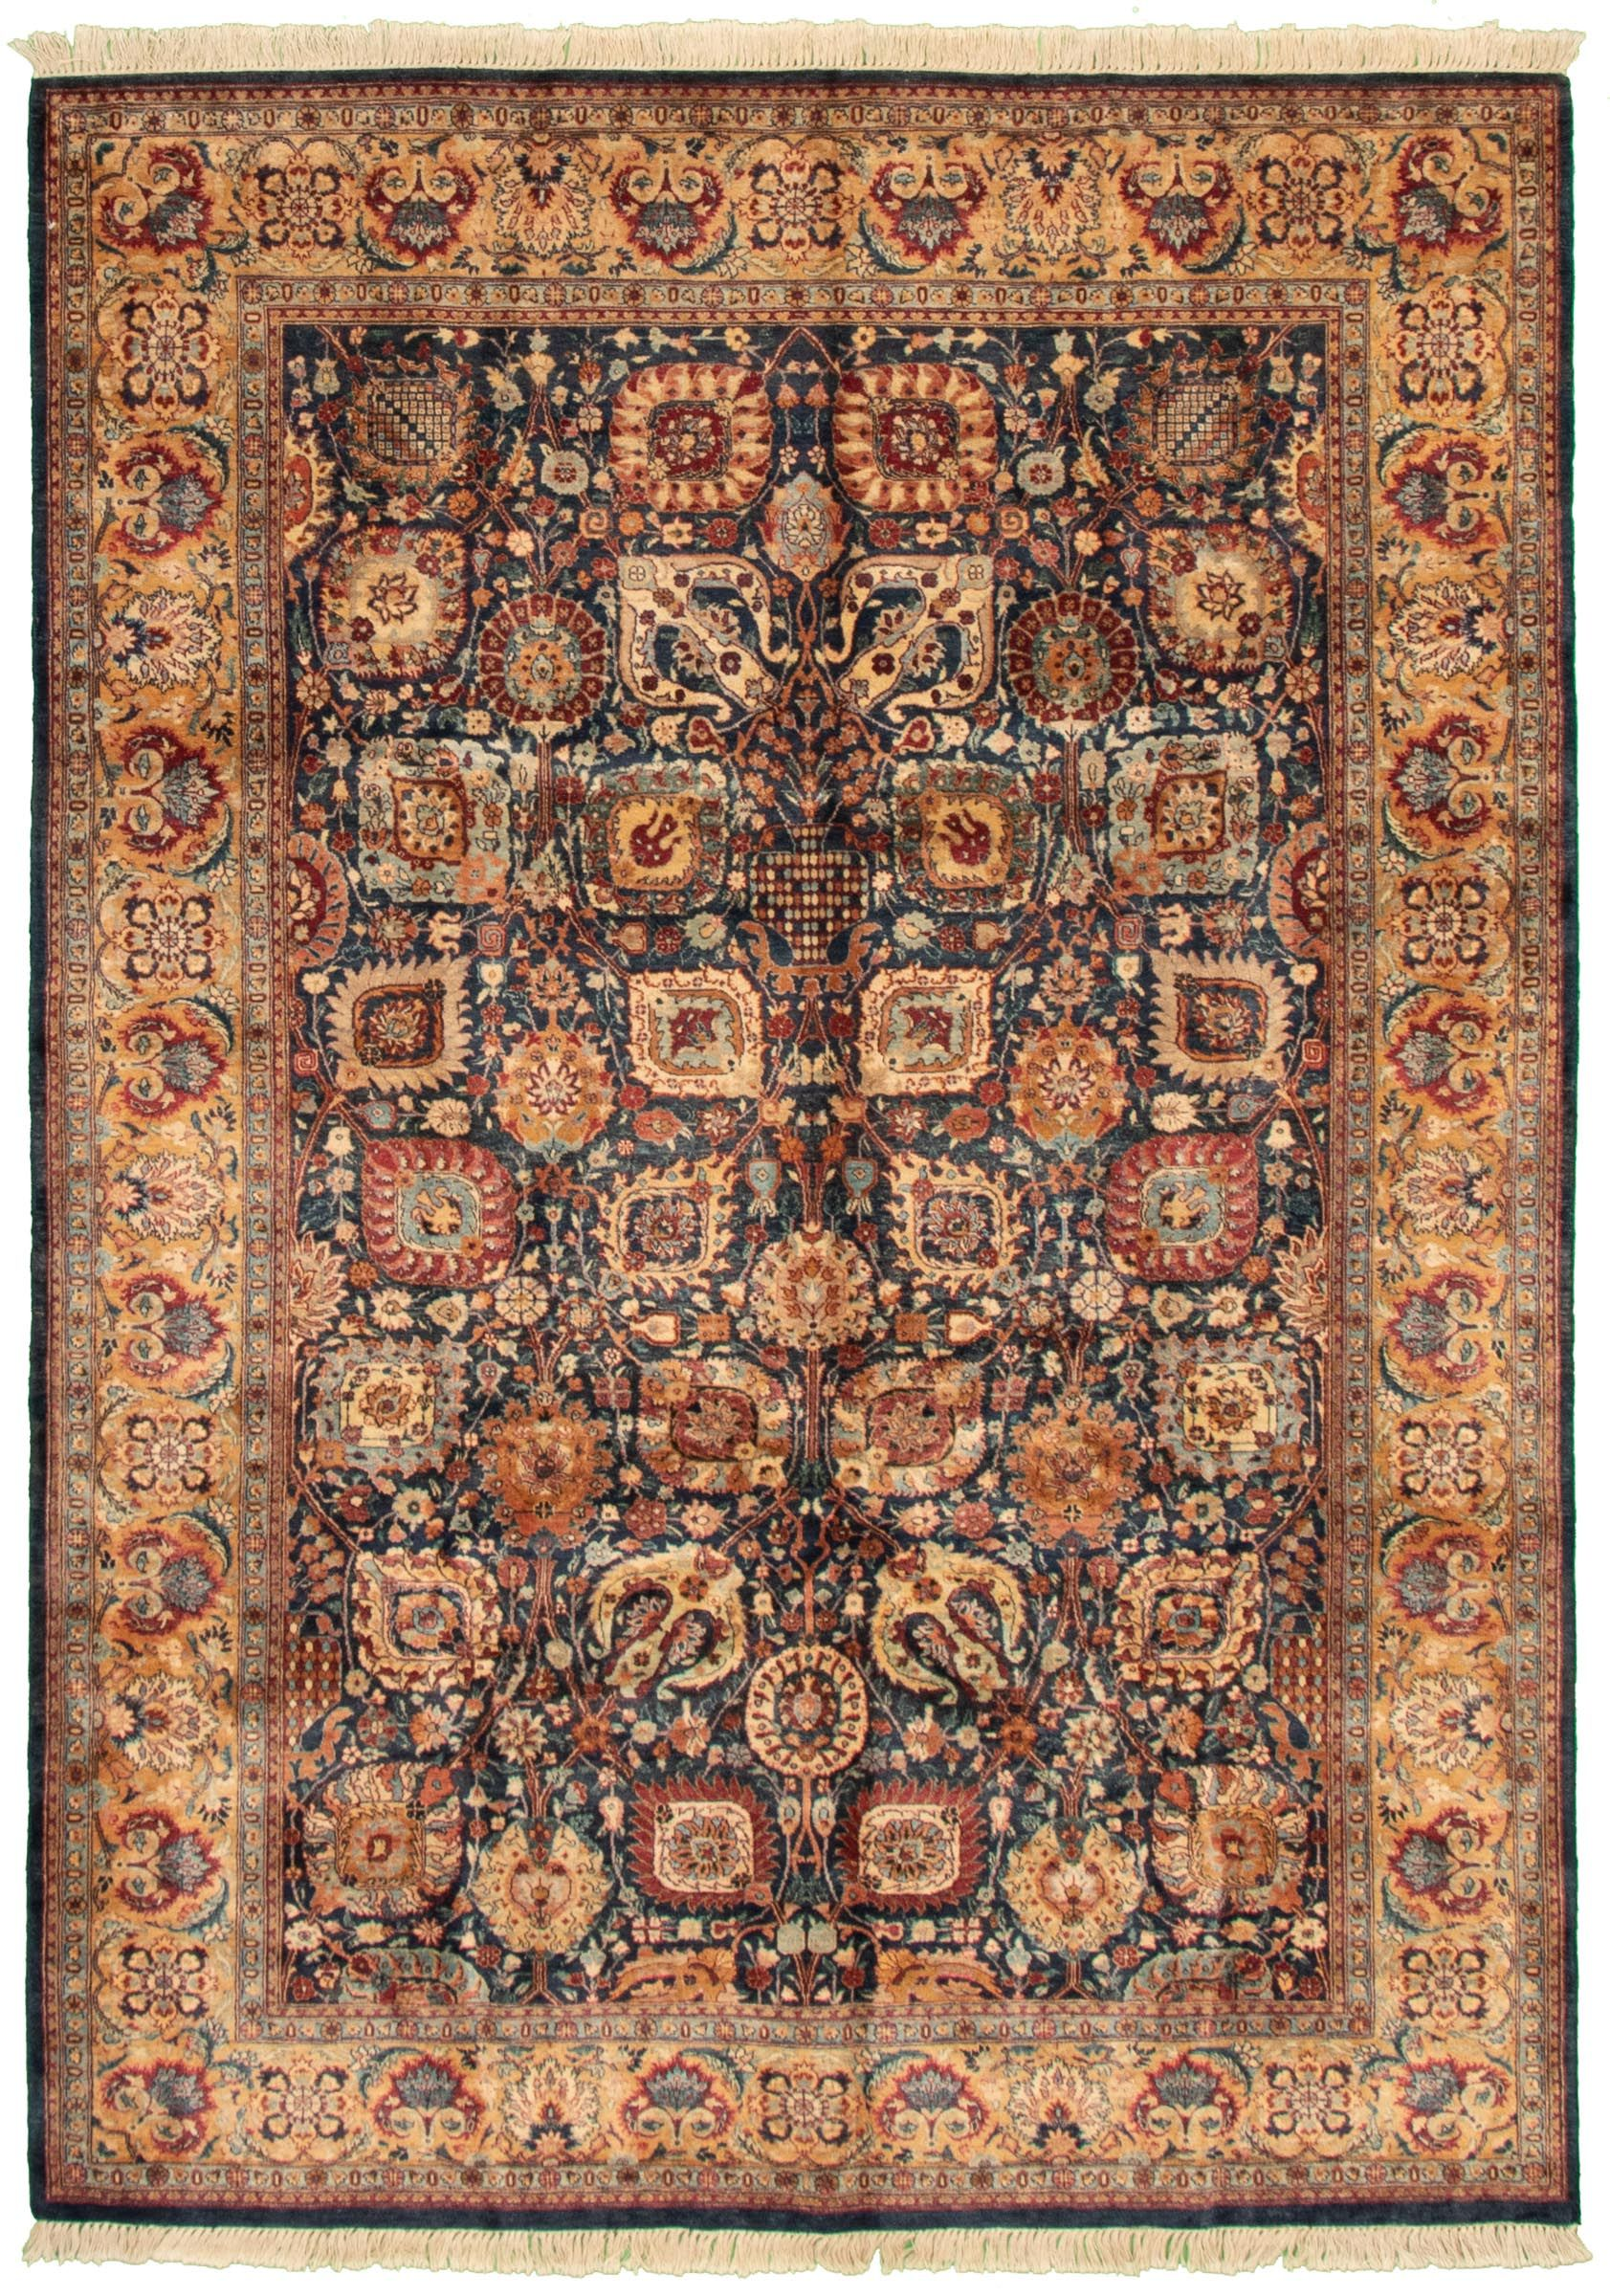 Pakistani Pako Persian 18 20 6 0 X 8 5 Hand Knotted Wool Dark Navy Rug Ecarpetgallery